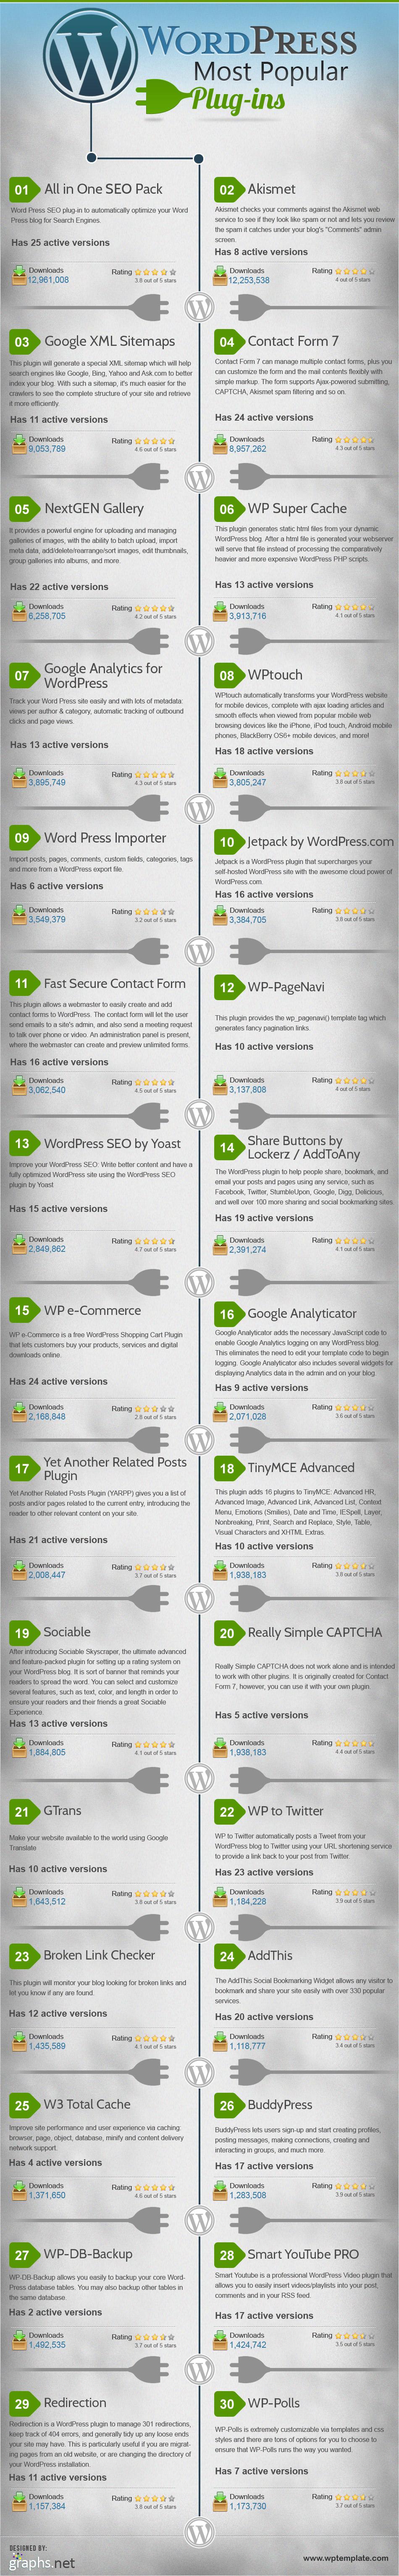 WordPress Plugins Top 30